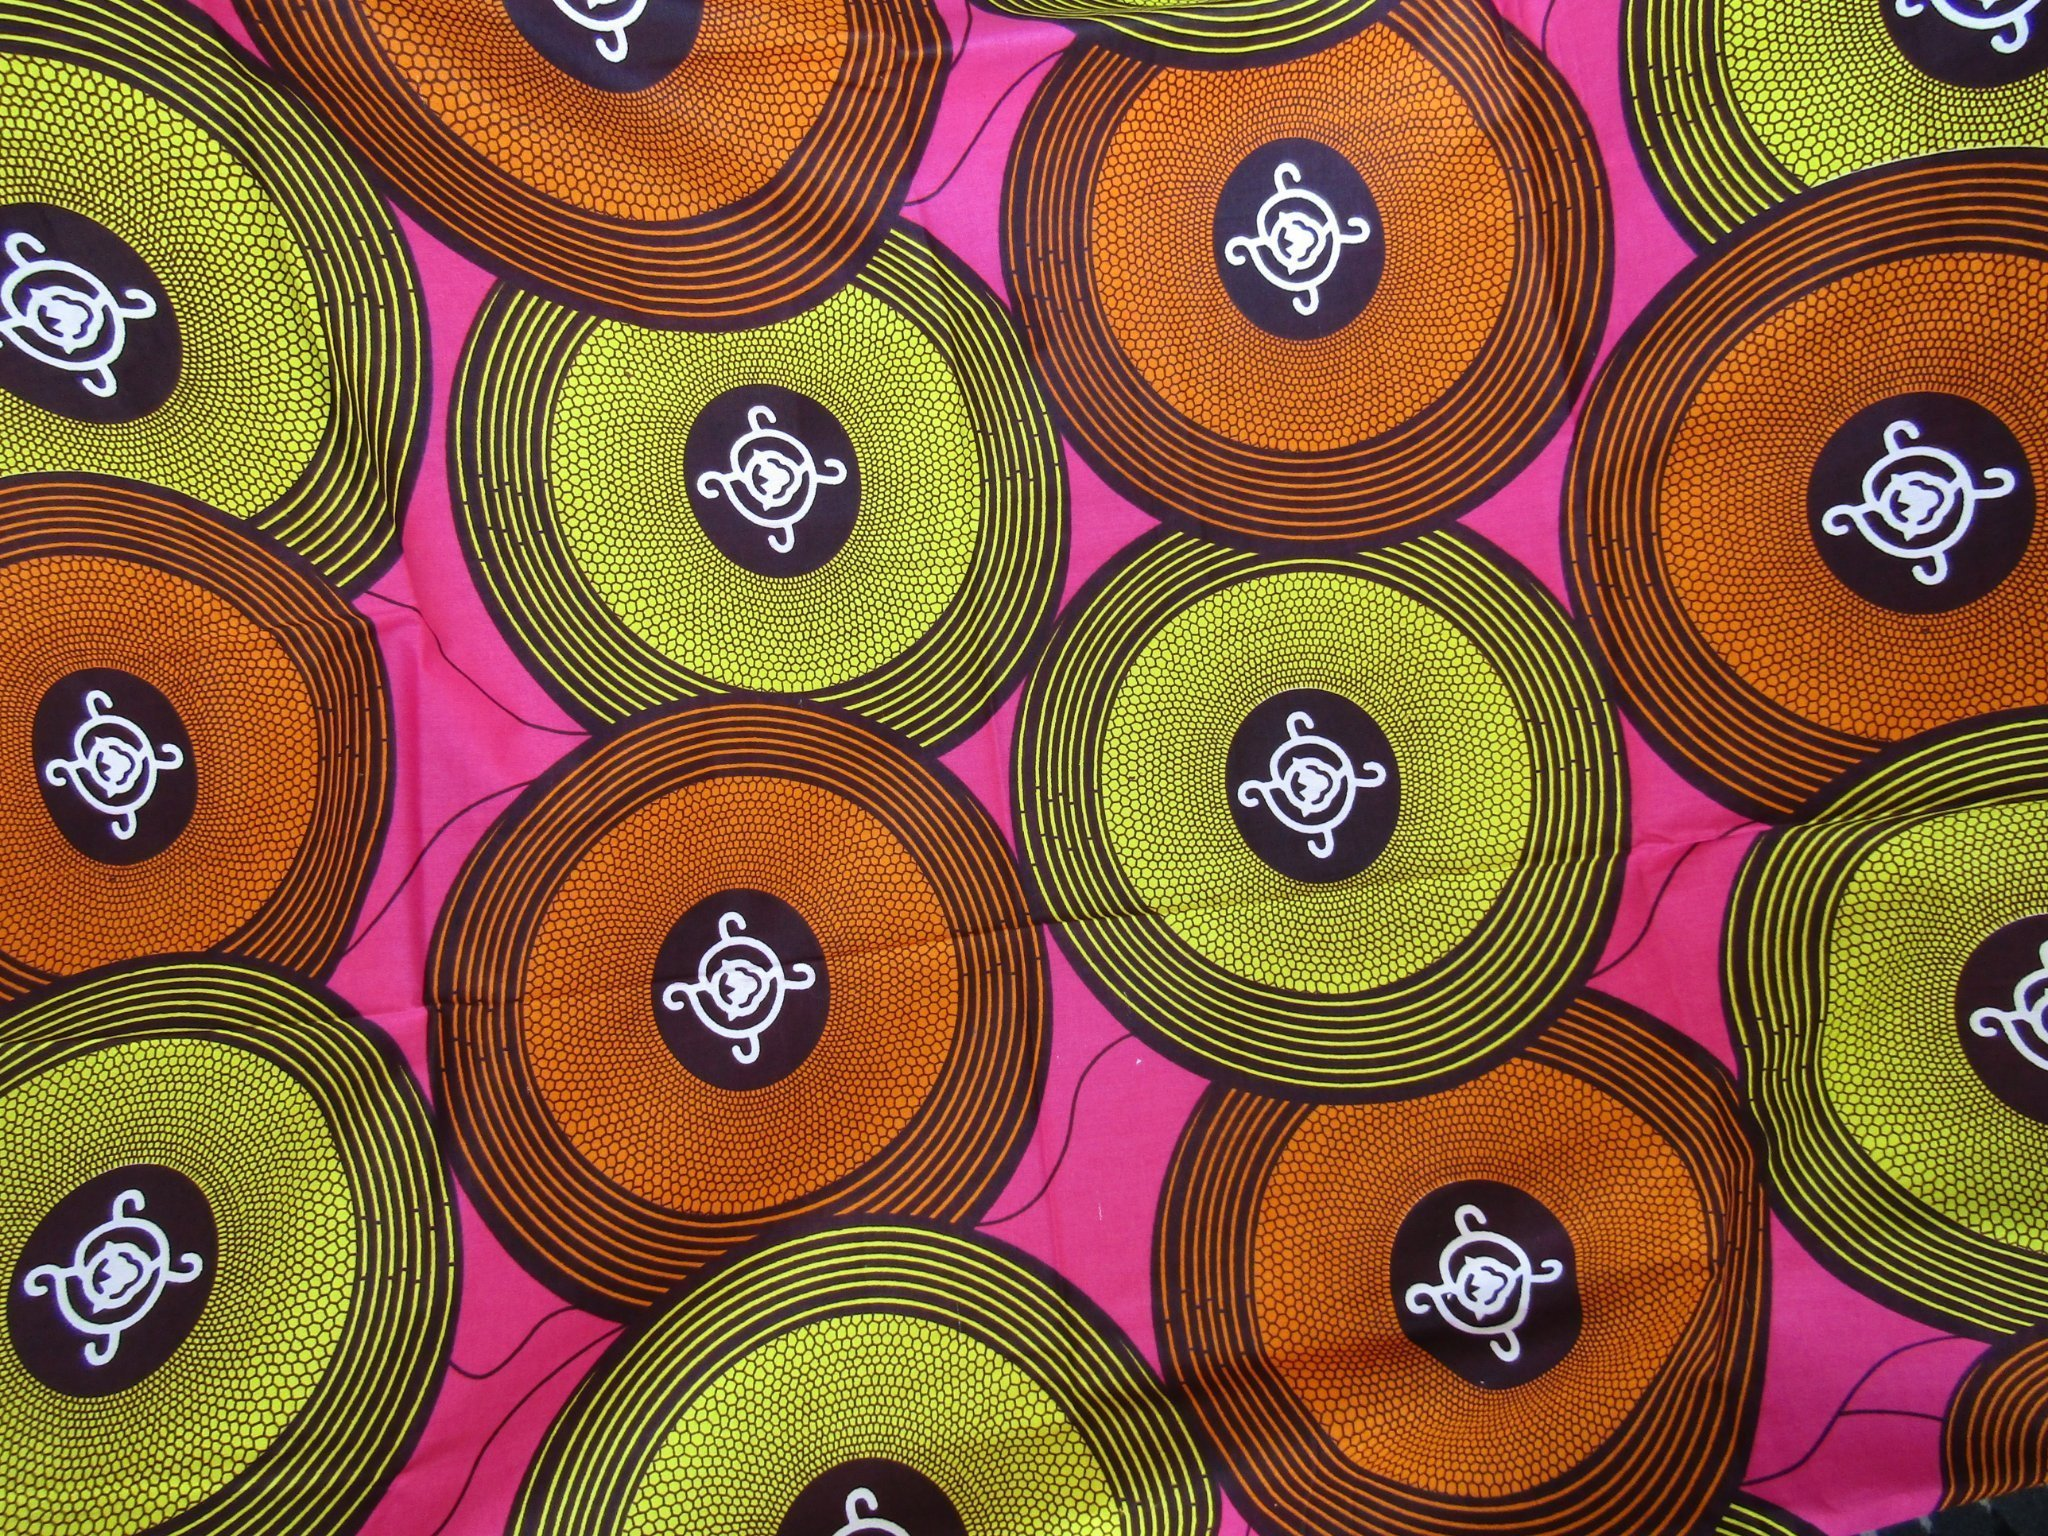 Populära Nytt tyg bomull Afrika unik design färg tryck m.. (364325881) ᐈ FP-36